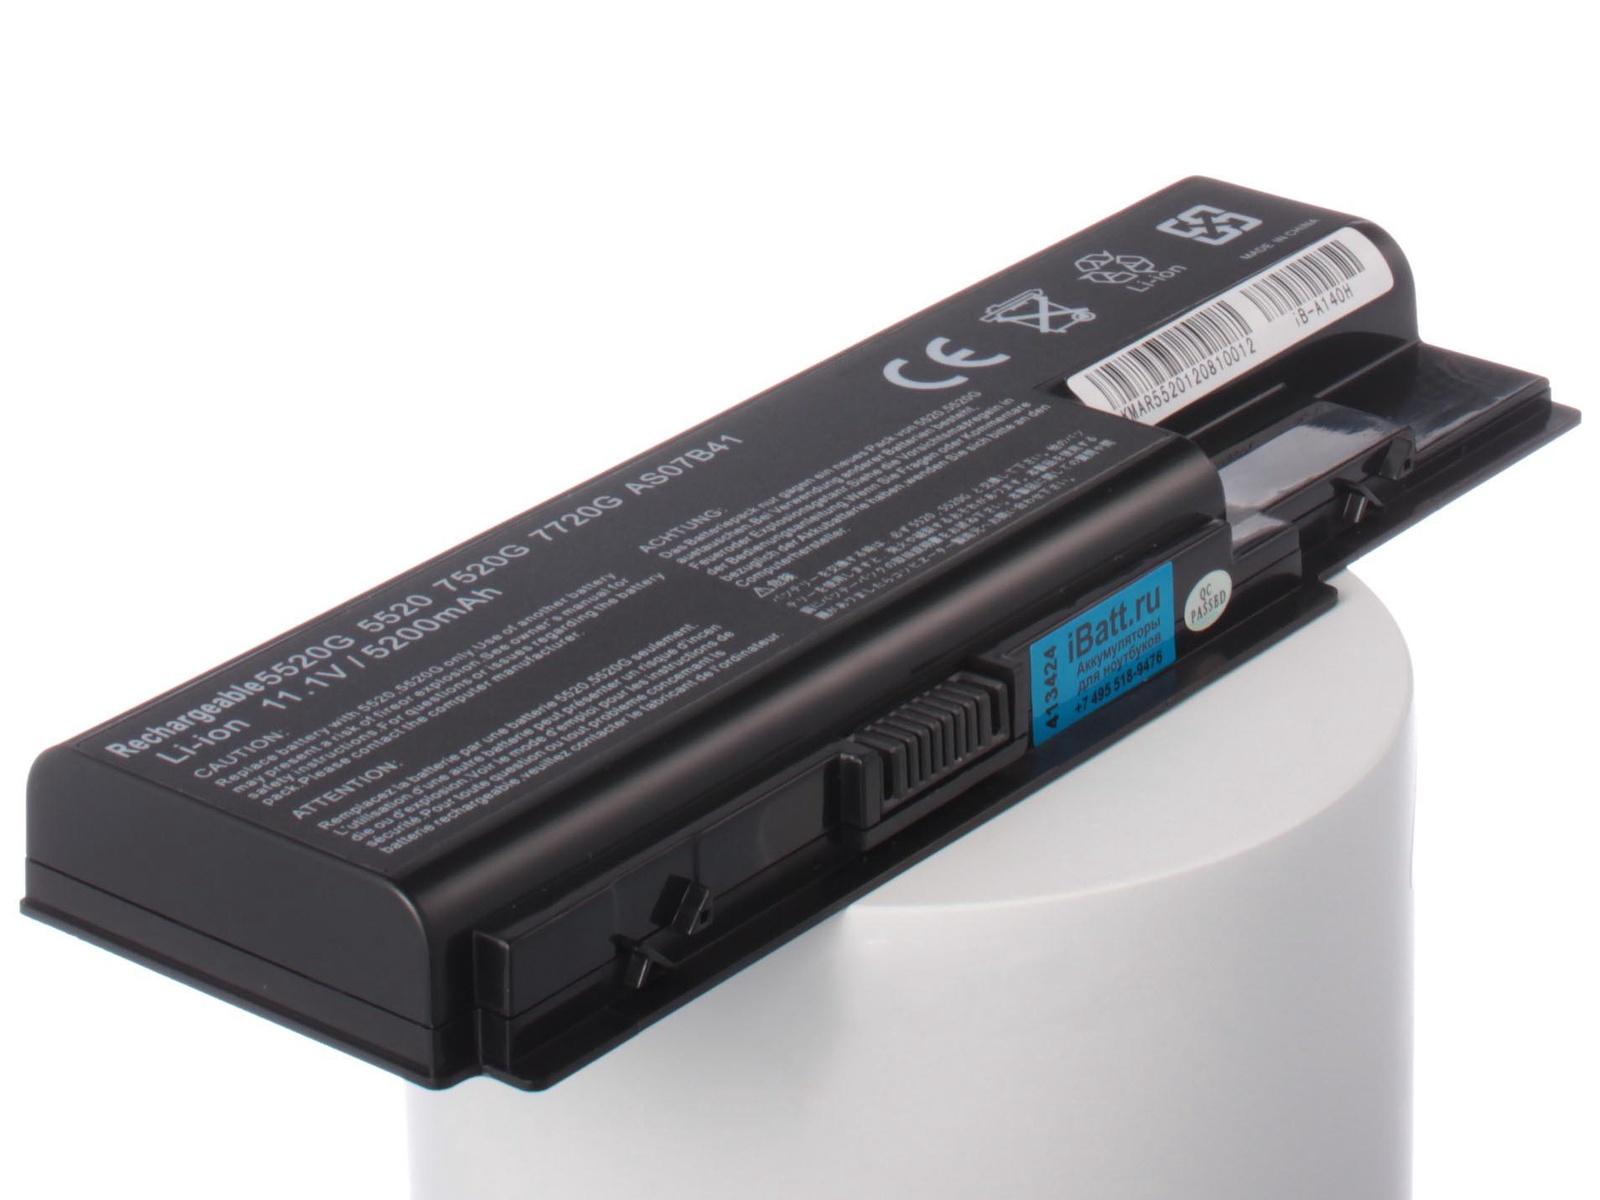 Аккумулятор для ноутбука iBatt для Acer Extensa 7630EZ-442G25Mi, Extensa 7630Z-423G25Mi, Aspire 5520G-502G16Mi, Aspire 5520G-503G25Mi, Aspire 5720G-1A1G16Mi, Aspire 5935G-664G32Mi, Aspire 5940G-724G50Wi, Aspire 5942G-728G64Bi блок питания palmexx 19v 3 42a для aspire one timelinex 1830 ferrari one travelmate extensa series pa 005